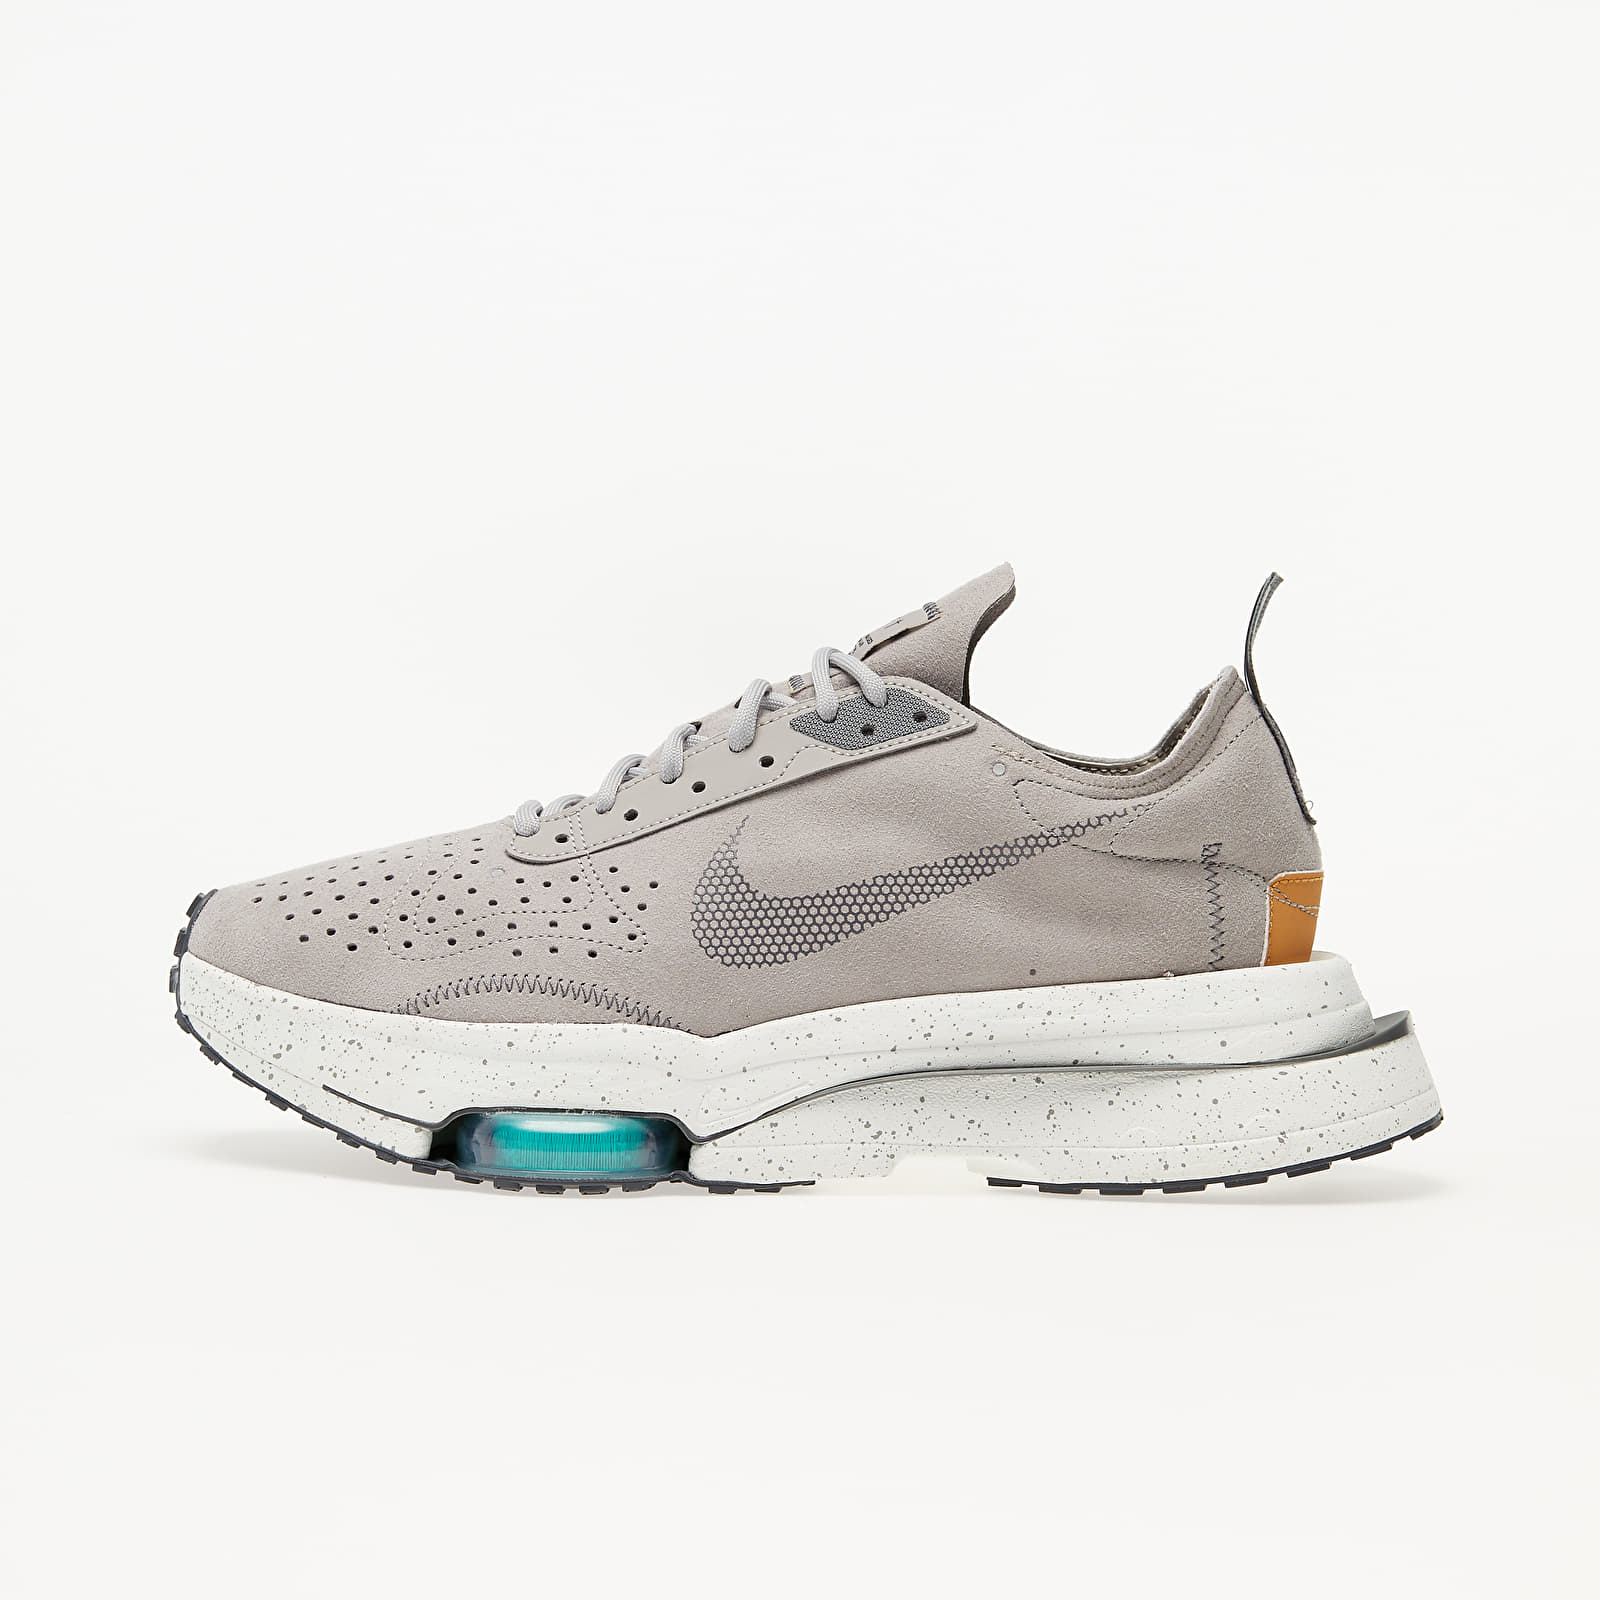 Pánske tenisky a topánky Nike Air Zoom-Type College Grey/ Dark Grey-Flax-Hyper Jade